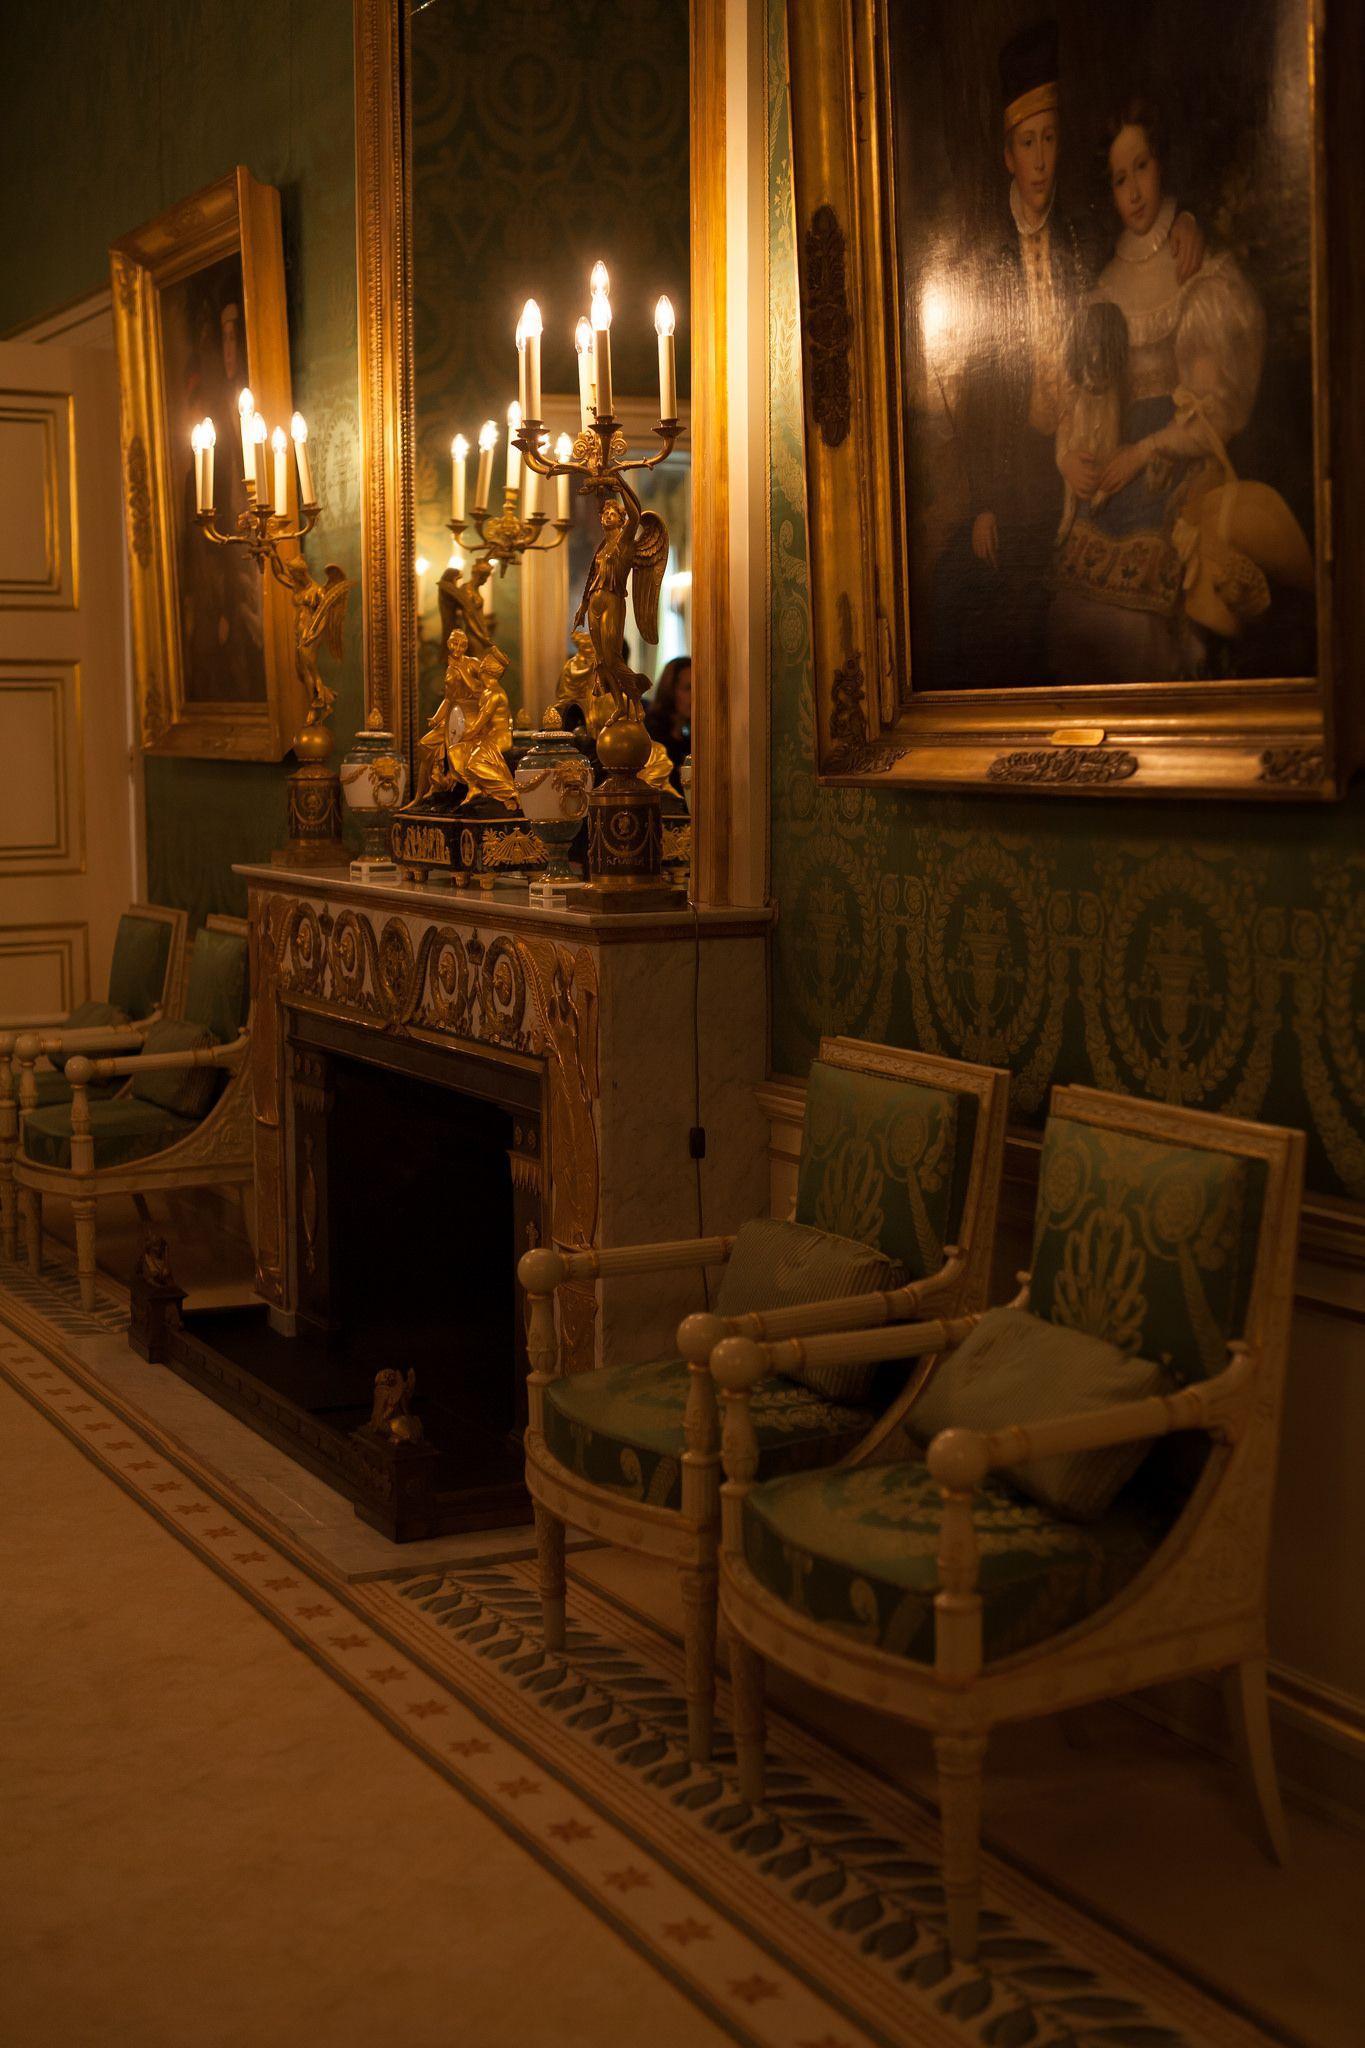 Paleis Noordeinde | Pinterest | Royals, Palace and Royal palace